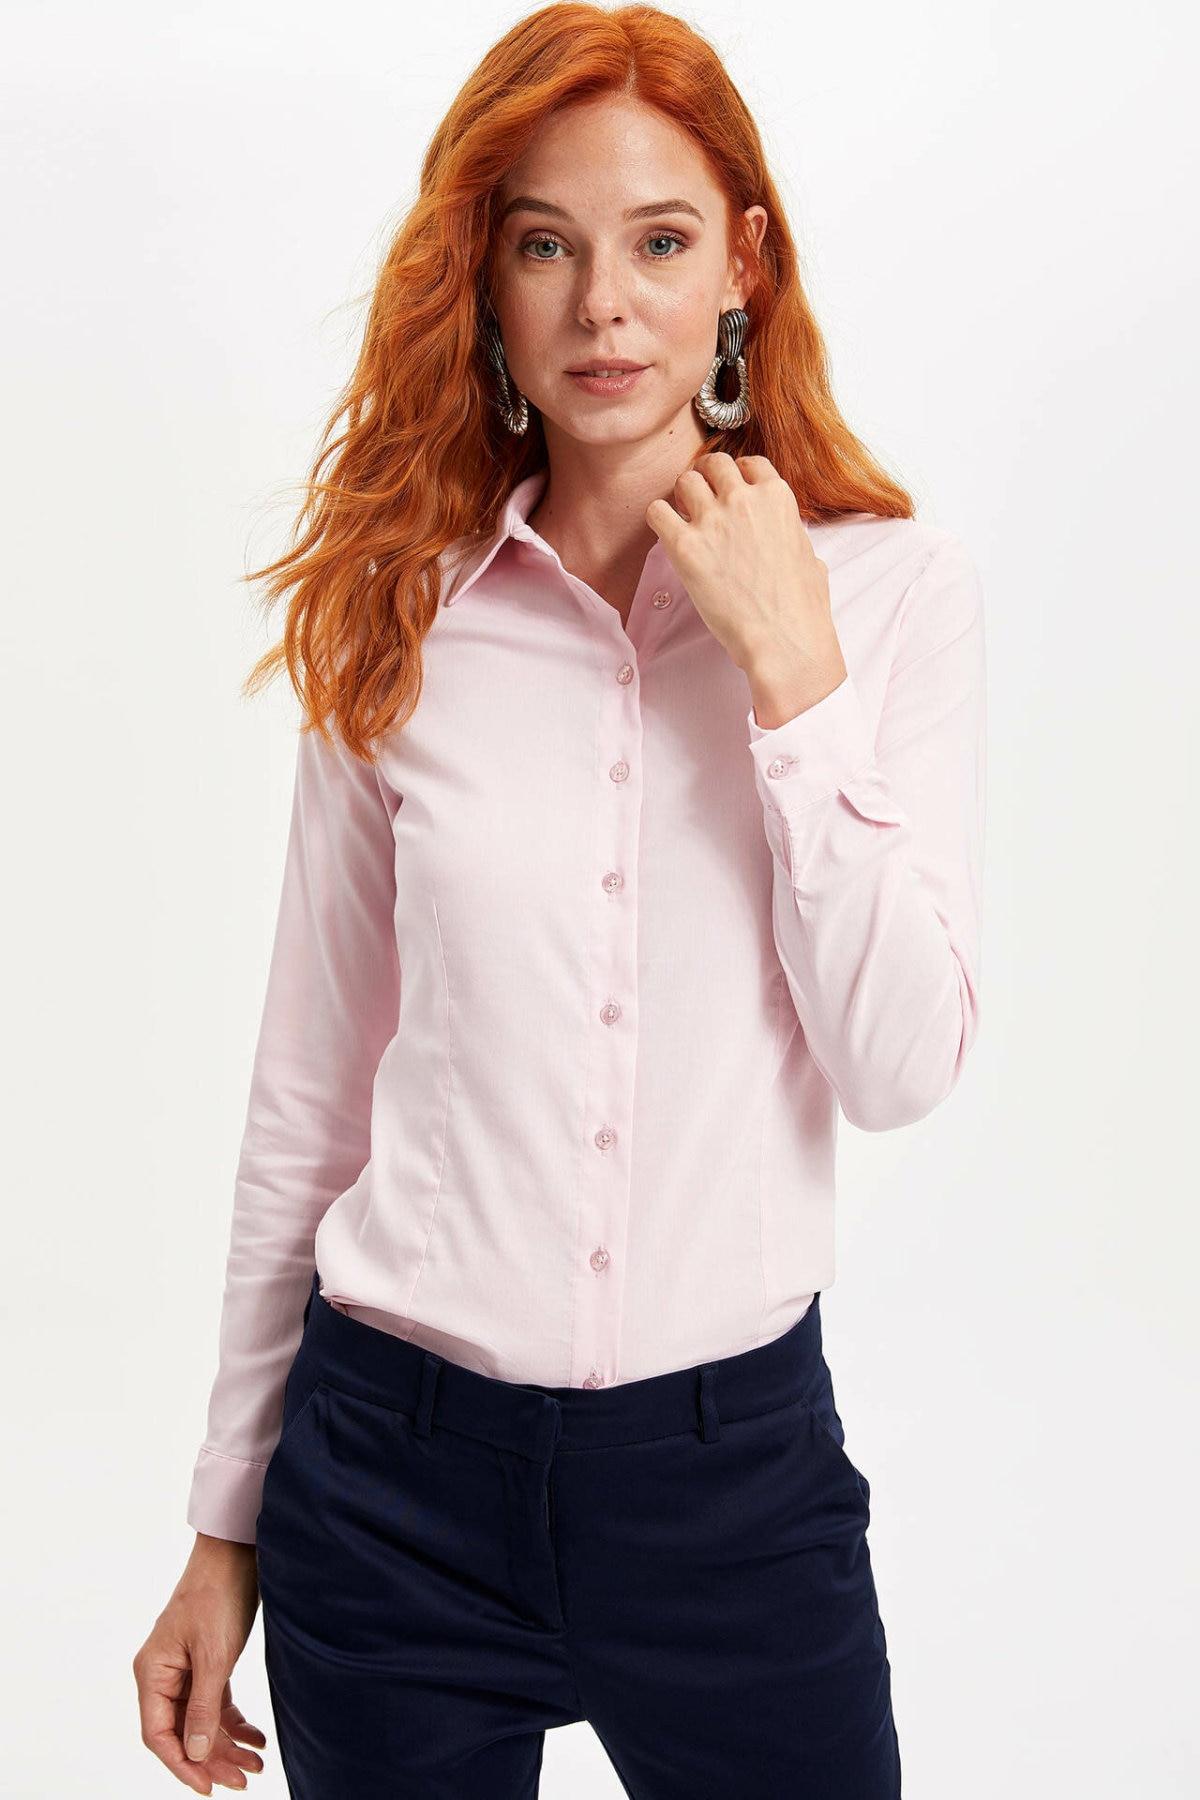 DeFacto Women Slim Fashion Lapel Collar Shirt Loose Pullover Casual Solid Long Sleeves Shirt Tops Women Autumn New - I5278AZ19AU